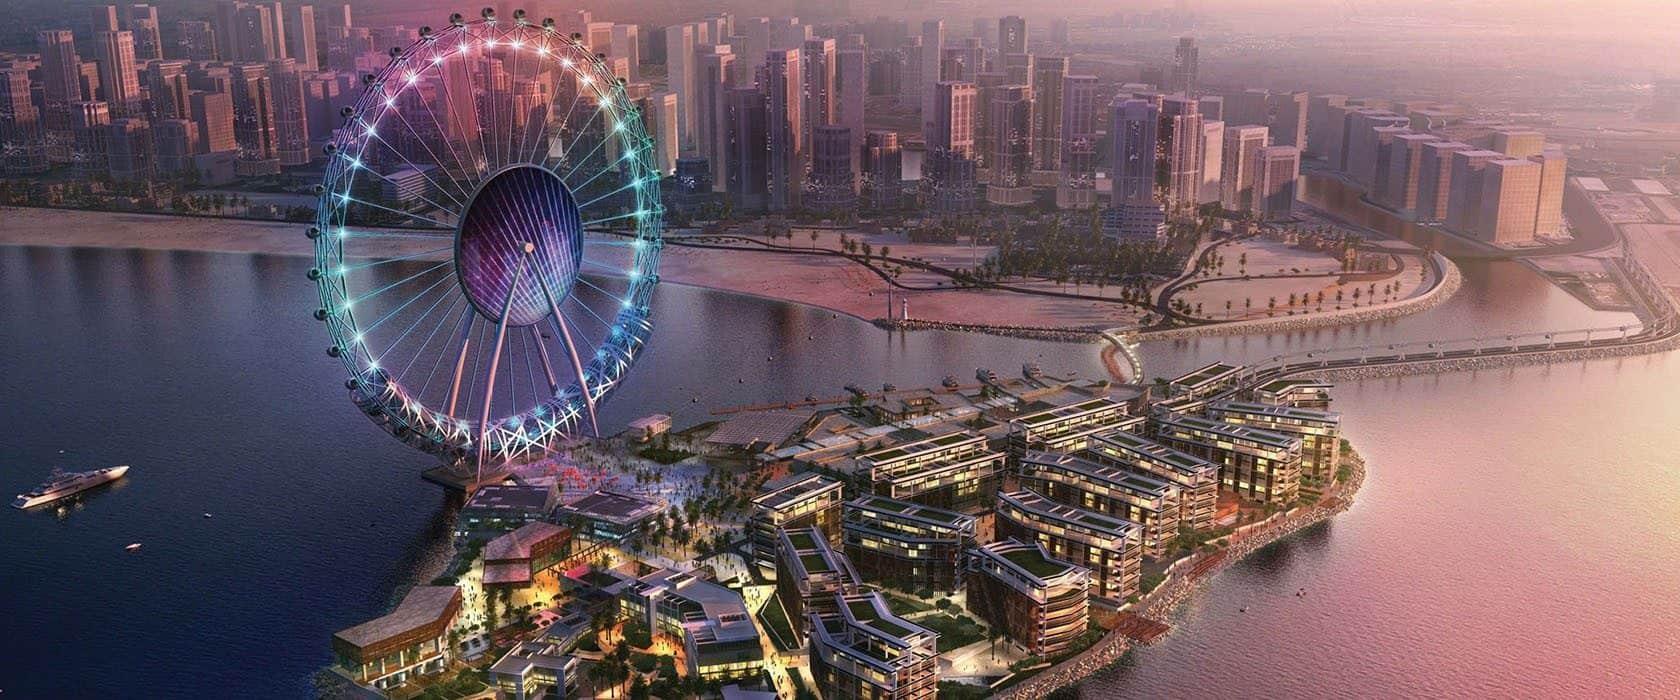 Worlds Tallest Ferris Wheel Dubai AIn Dubai